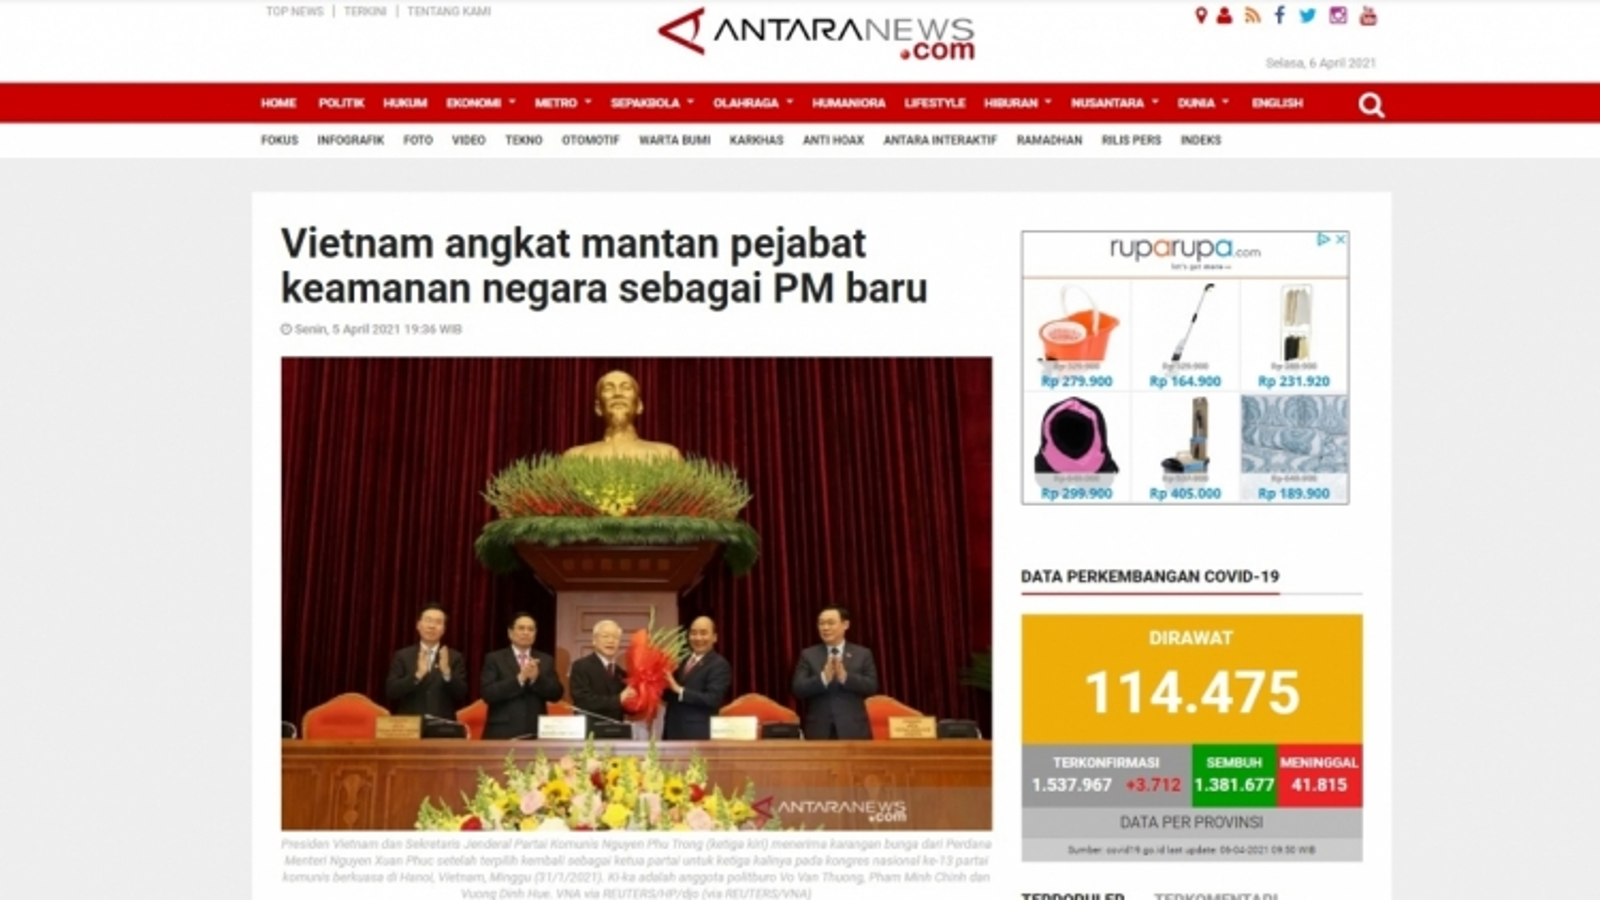 Indonesian media appreciative of new Vietnamese leadership